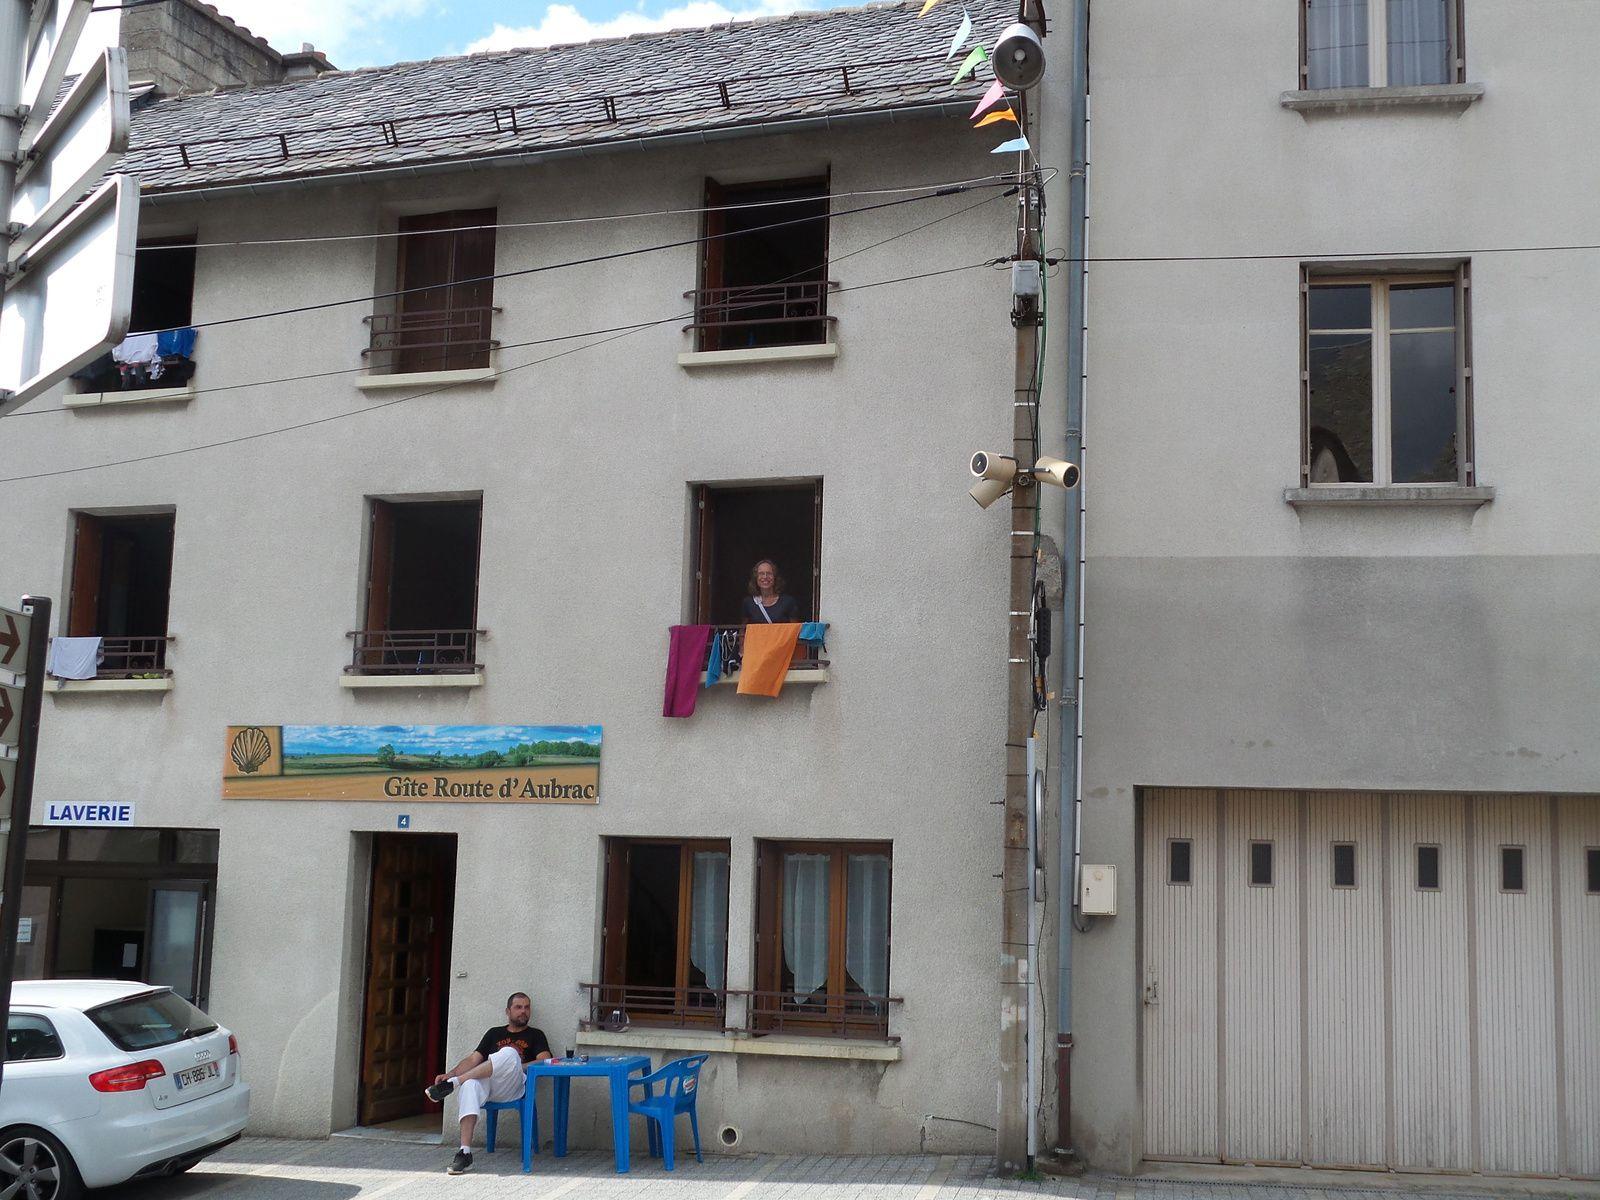 J4 Saint - Alban à Aumont - Aubrac 15,4 km